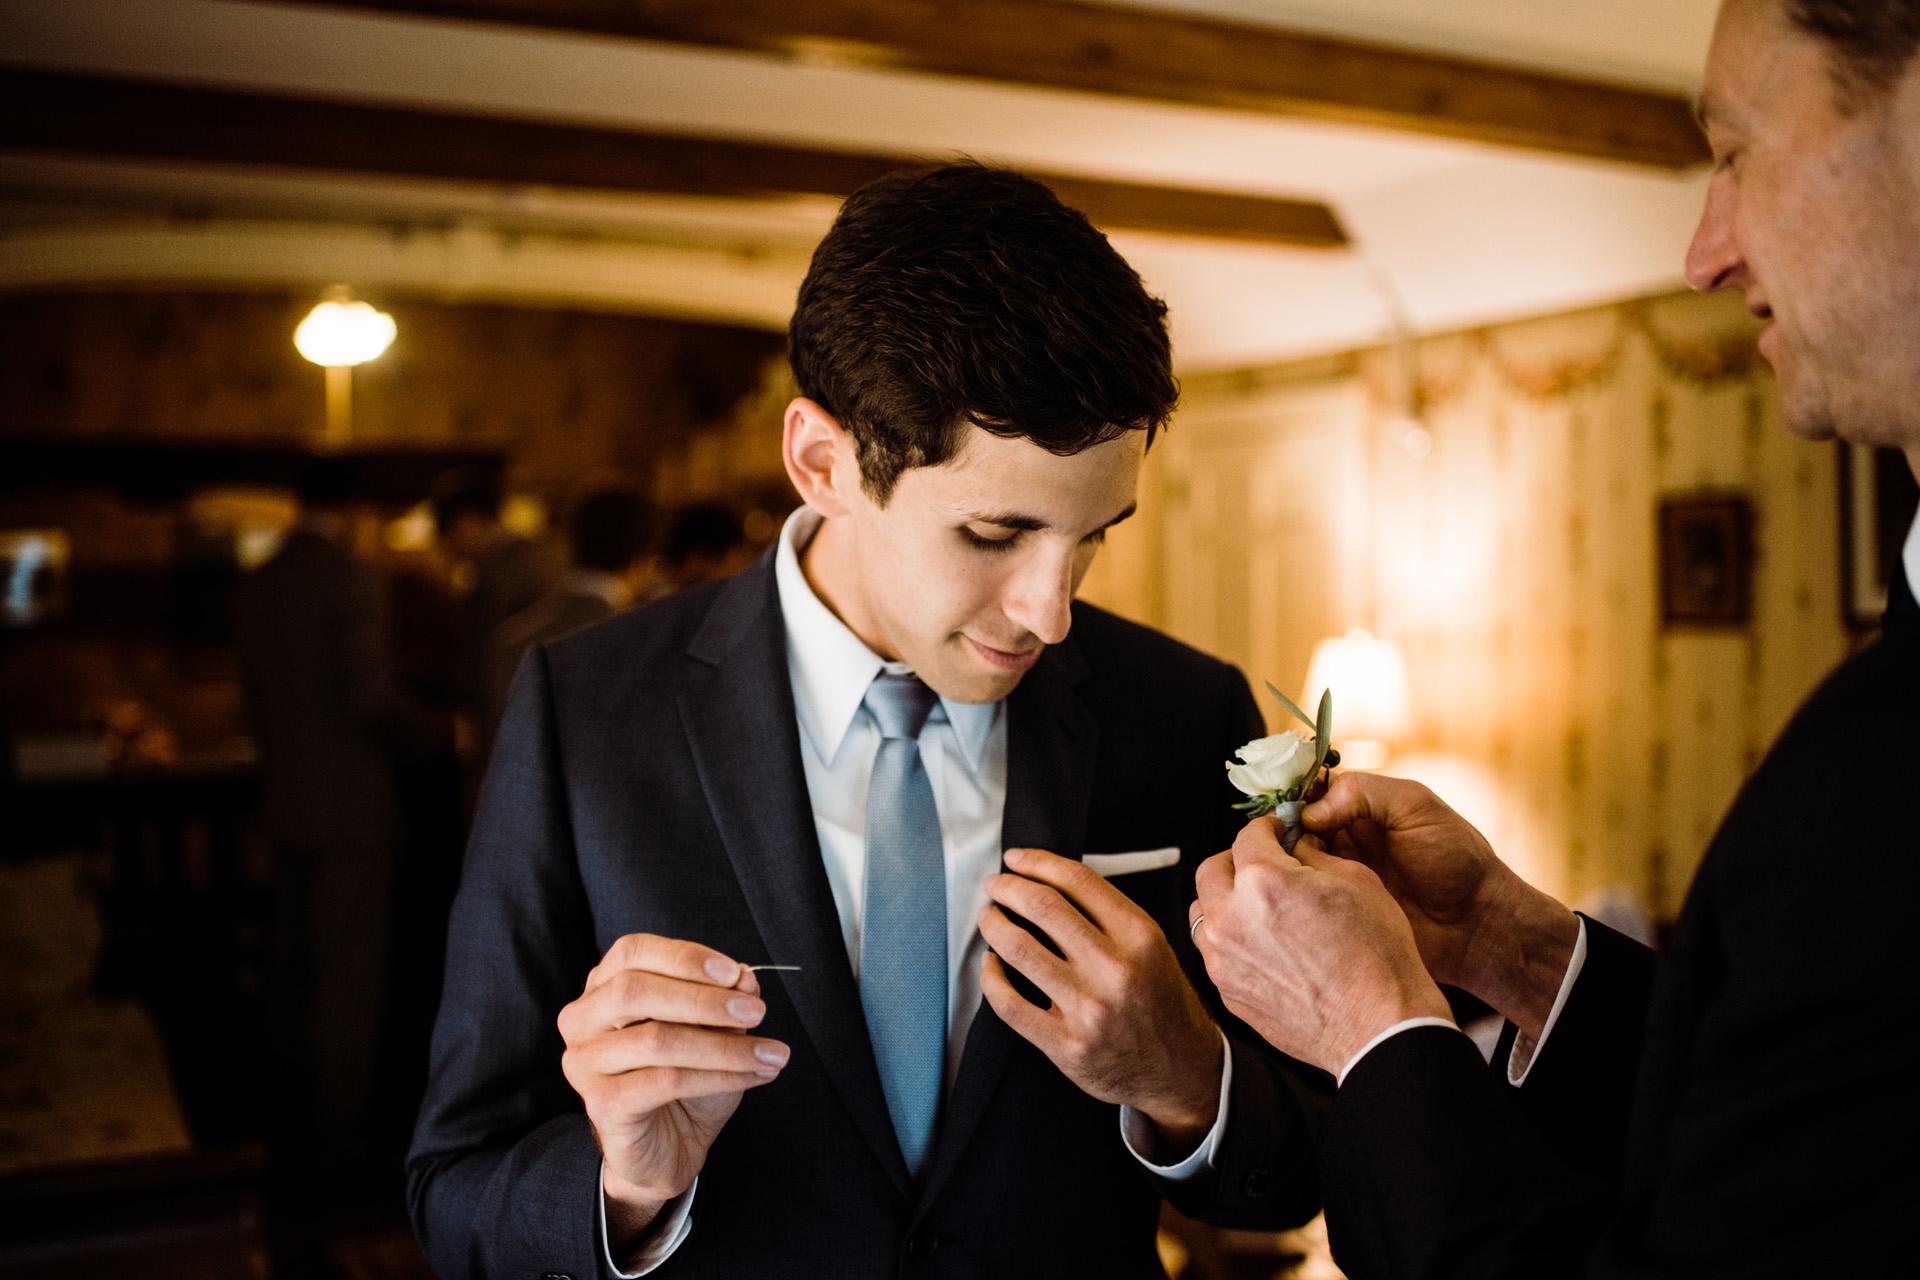 west-mountain-inn-wedding-vermont-05